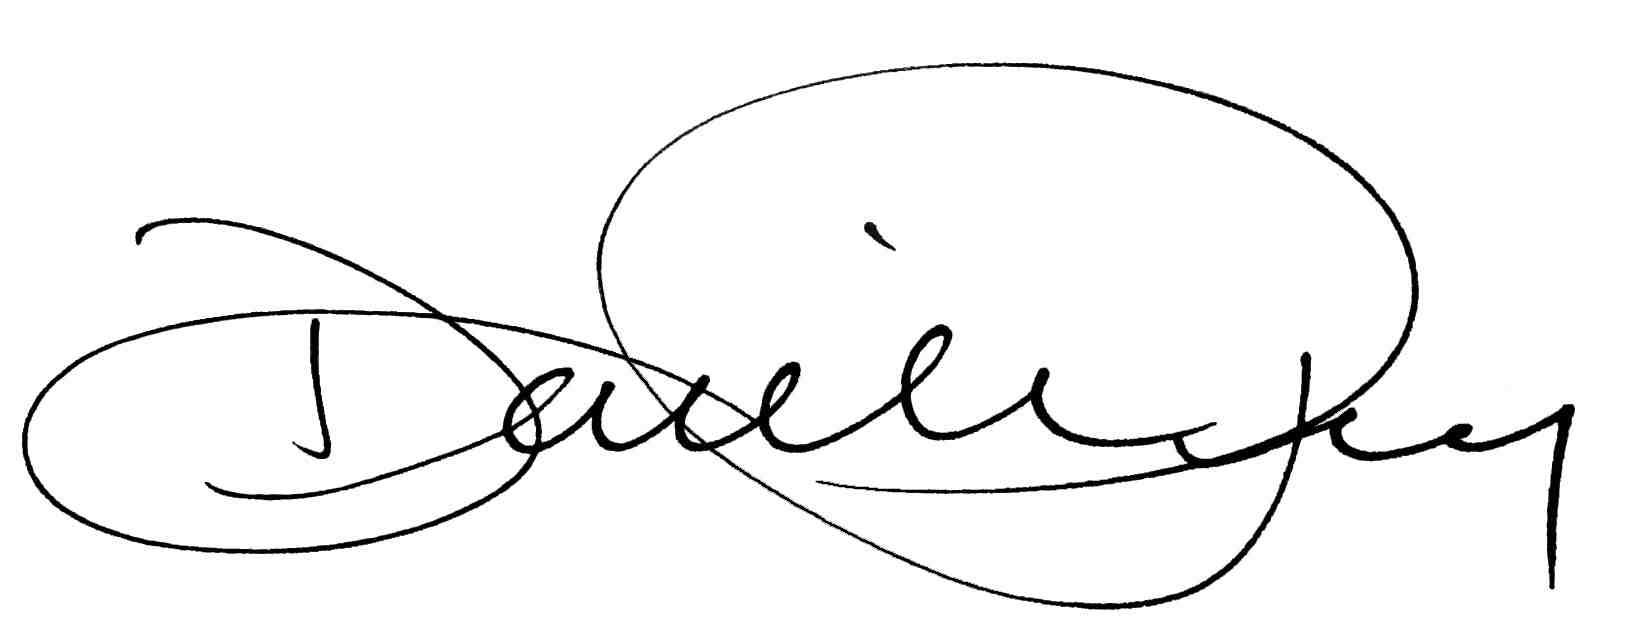 Danielle  Perry's Signature